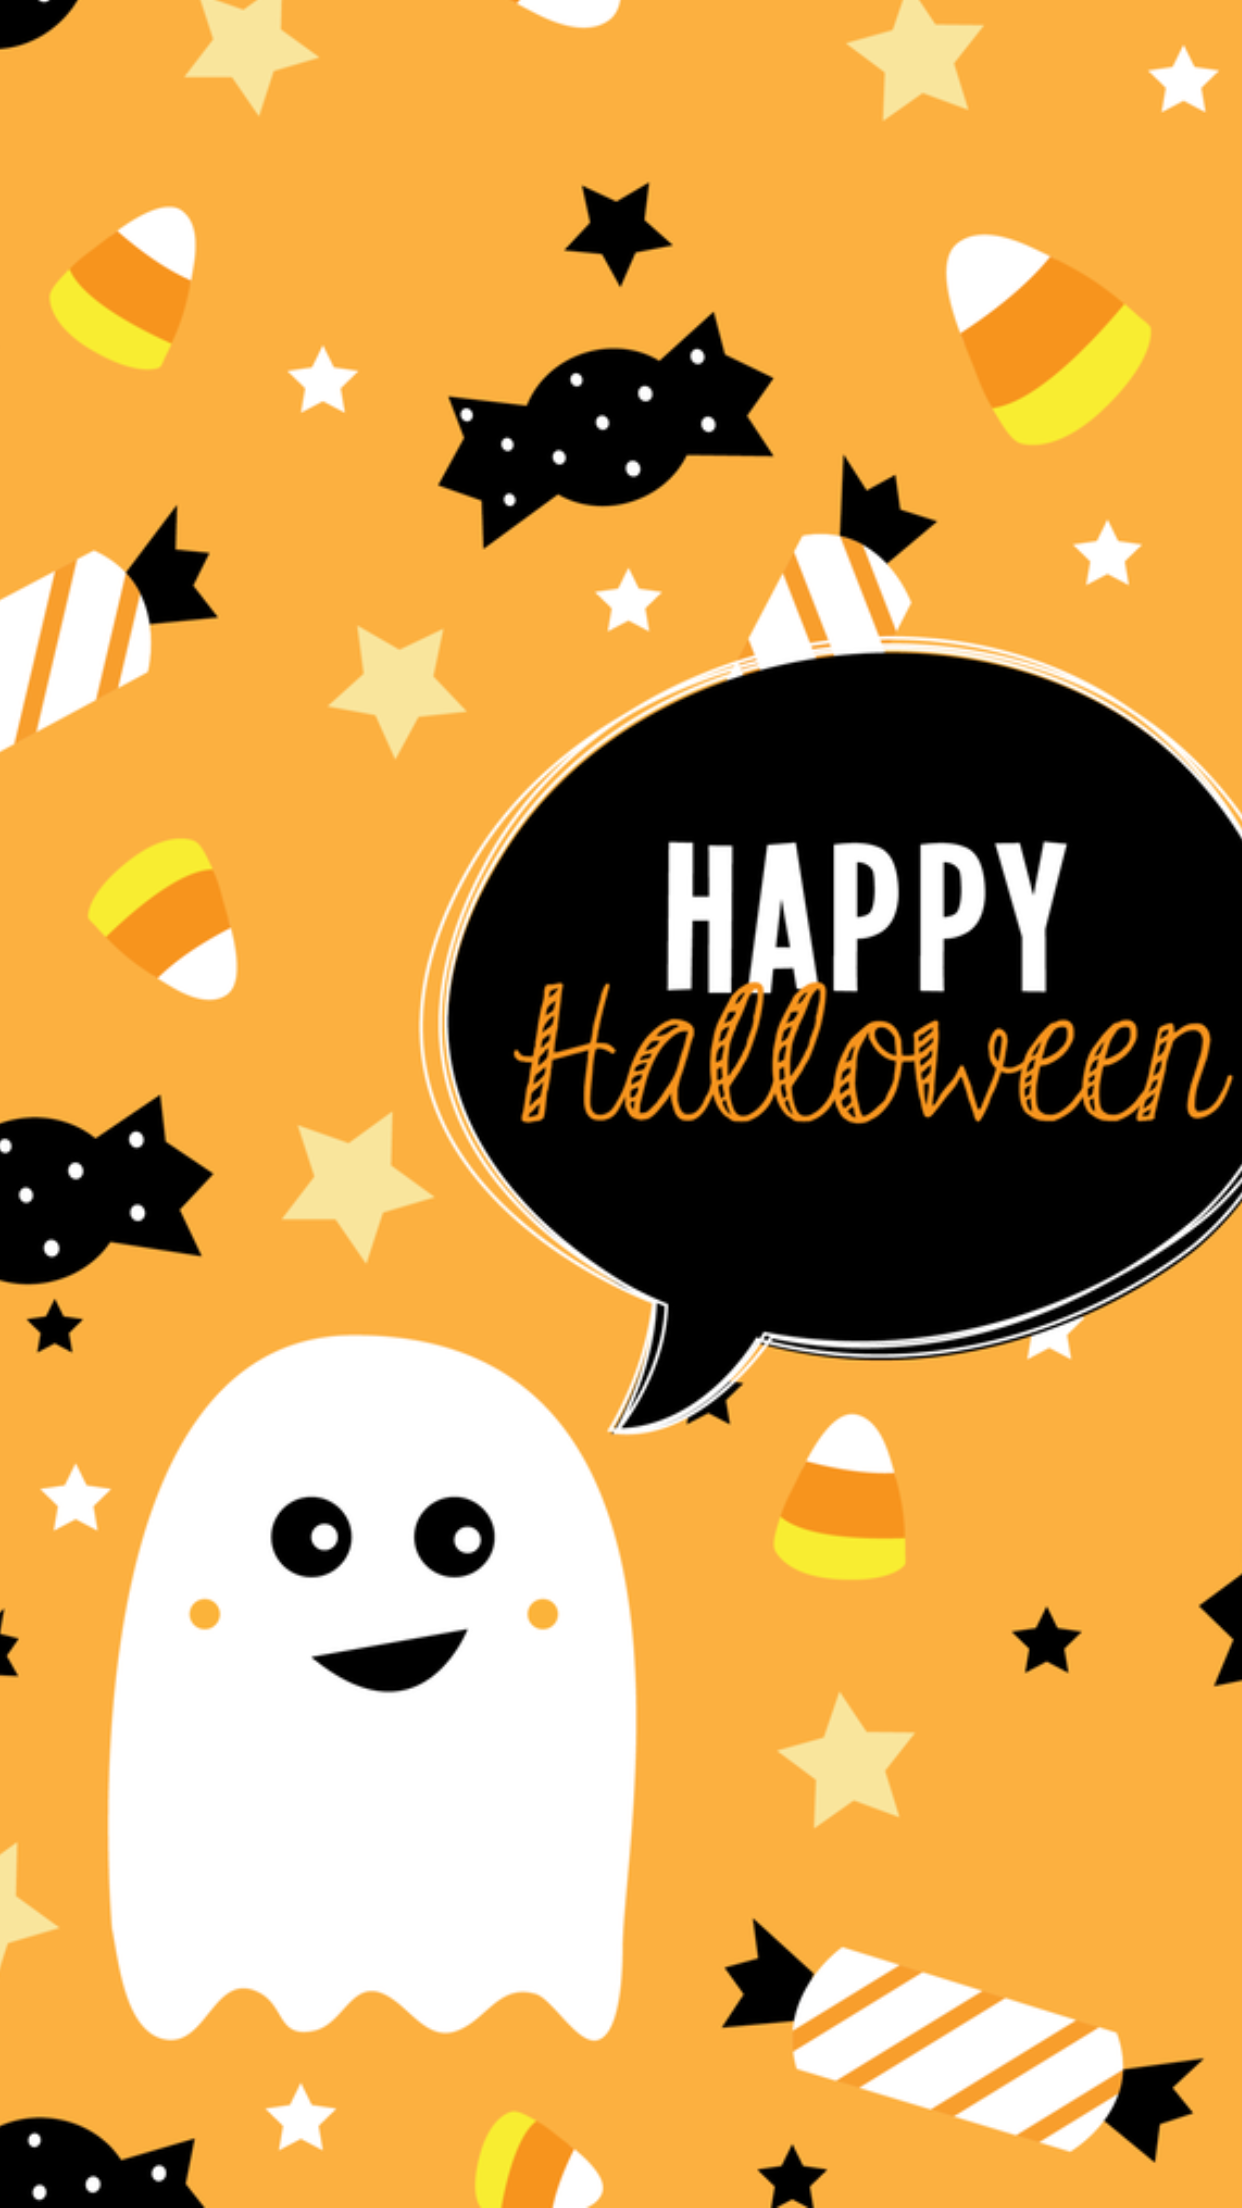 Most Inspiring Wallpaper Halloween Pinterest - 75ce2f21948d0fab52ba7111353bed9b  Picture_449721.png